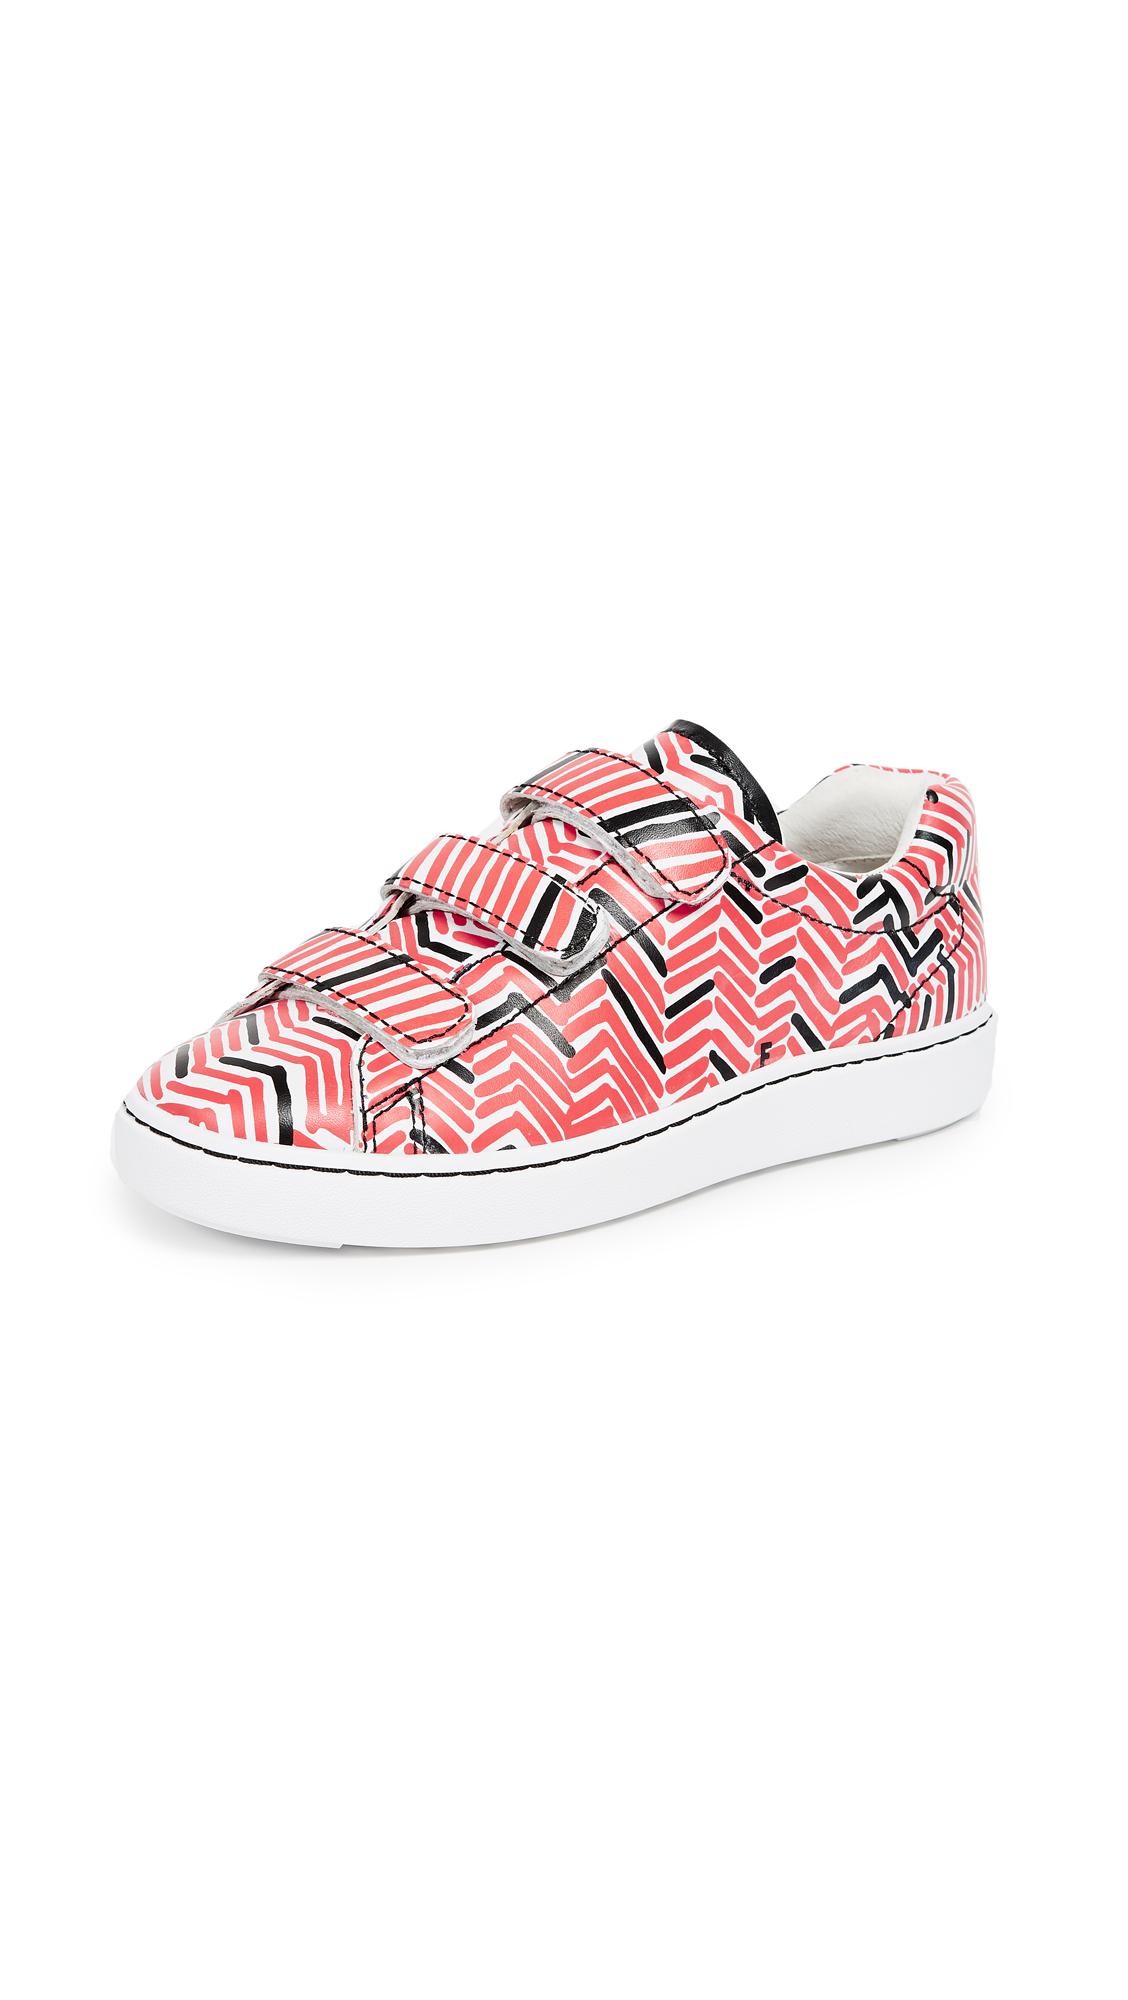 Ash x Filip Pagowski Pharrel Tweed Sneakers - White